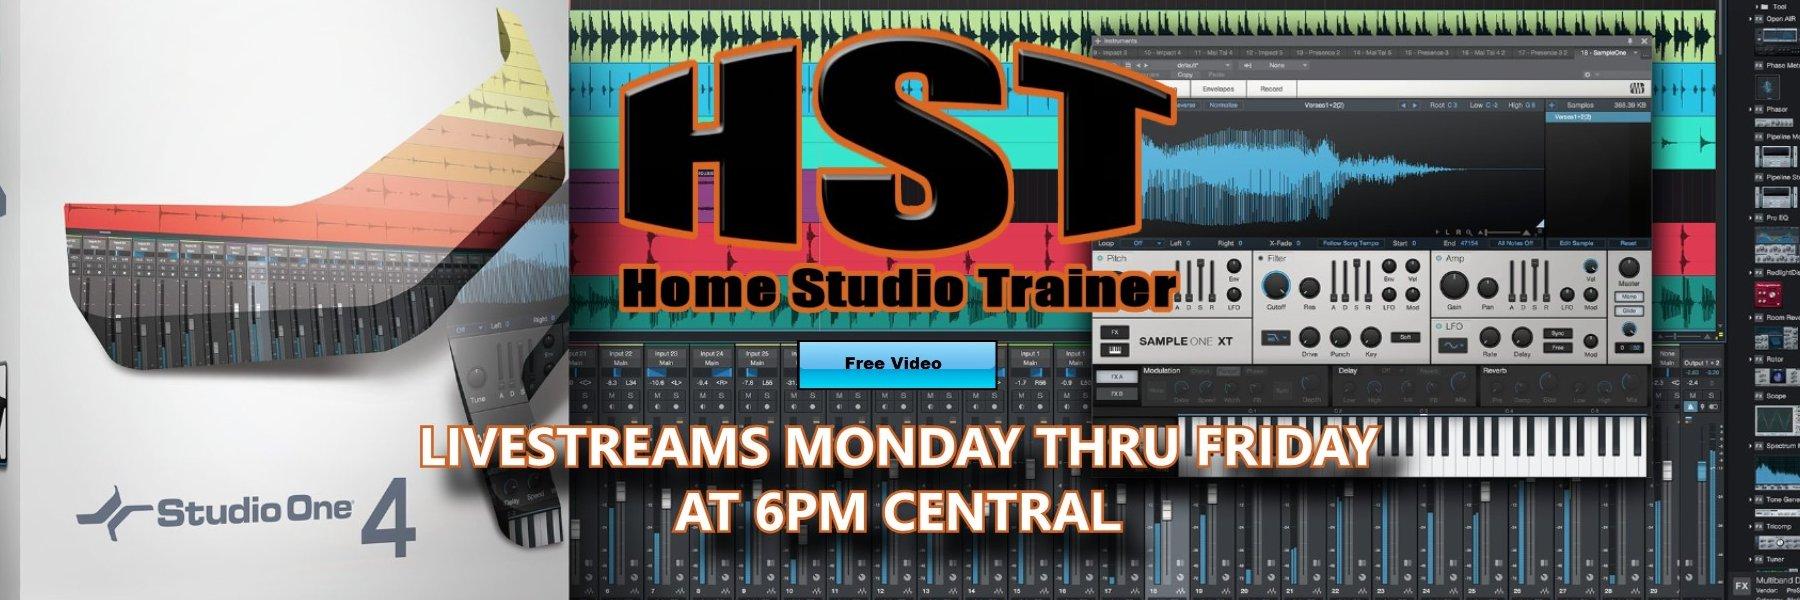 Over 40 Studio One 4 Master Class Videos